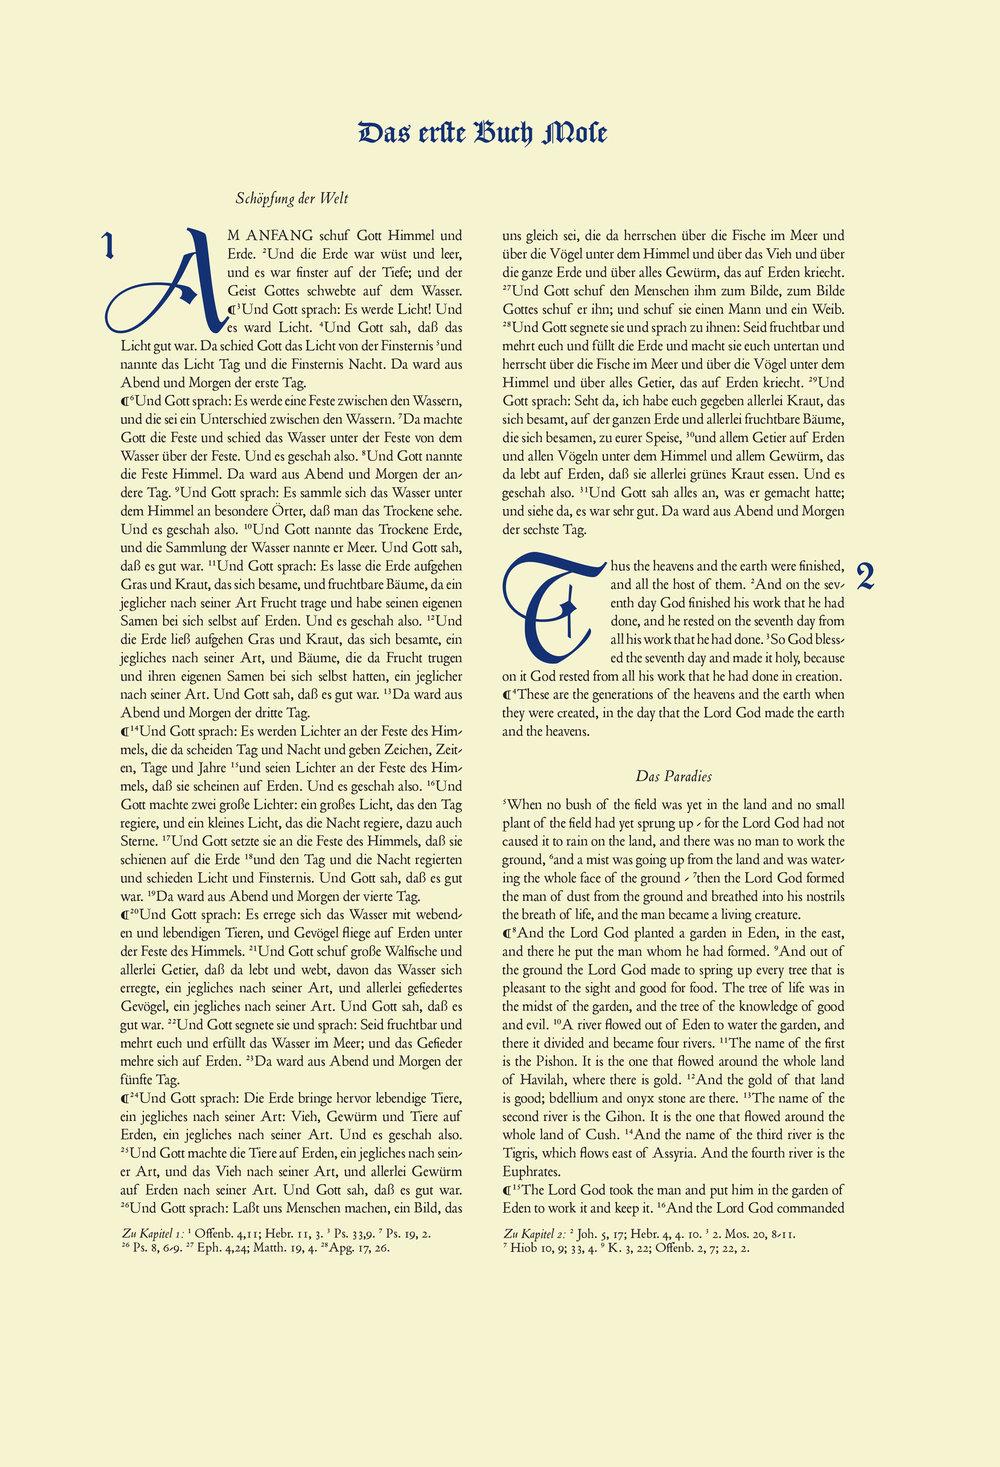 HERMANN ZAPF  Germany, 1955  Poliphius, Blado, Caslon Blackletter  22.5 X 33 cm  Letterpress  Liber Librorum Collection